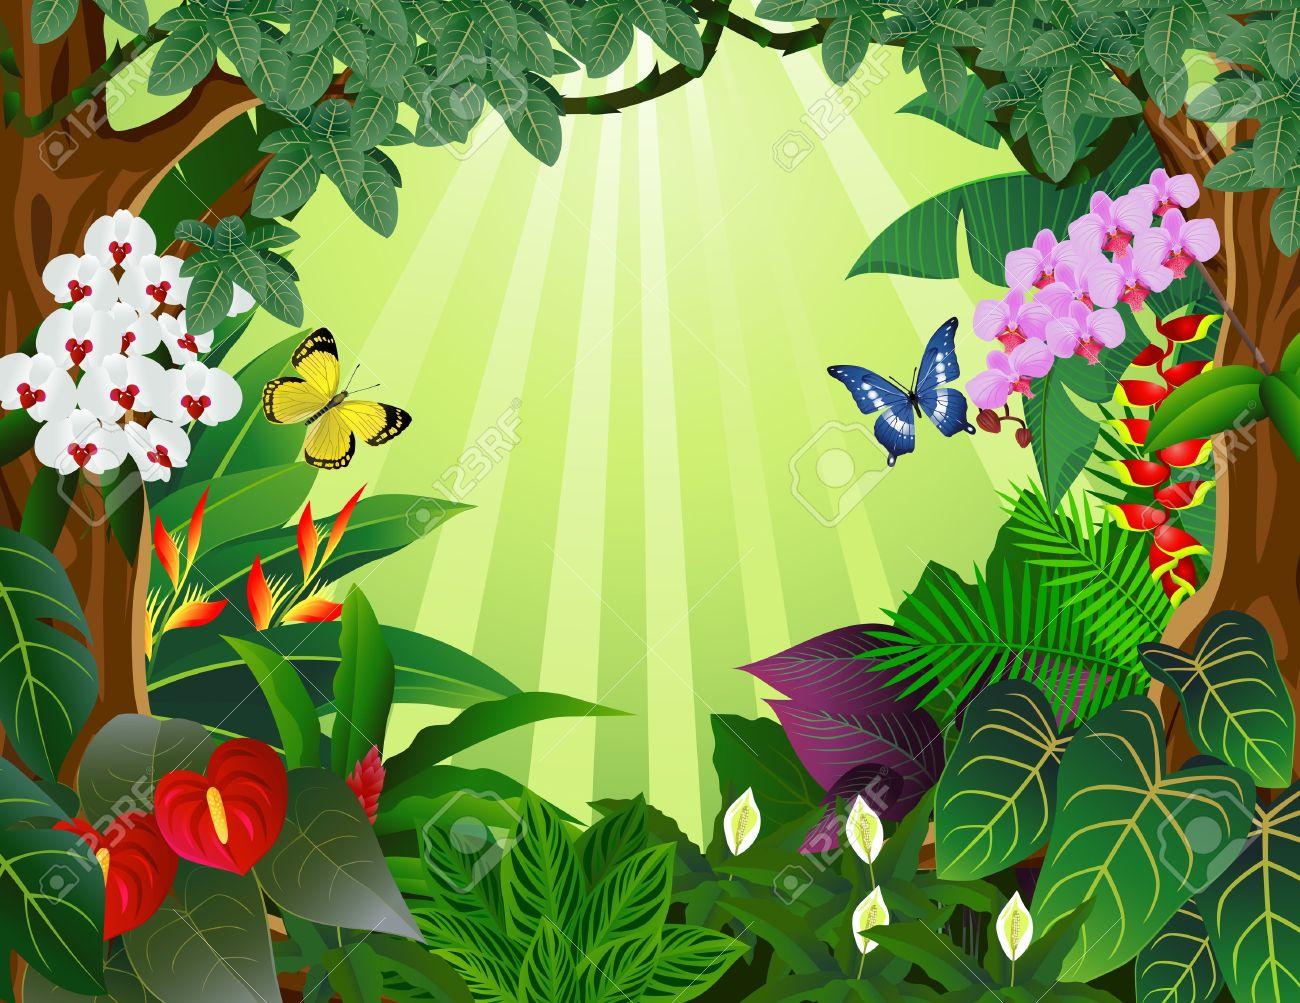 Tropical Rainforest Clipart - Blogsbeta-Tropical Rainforest Clipart - Blogsbeta-18